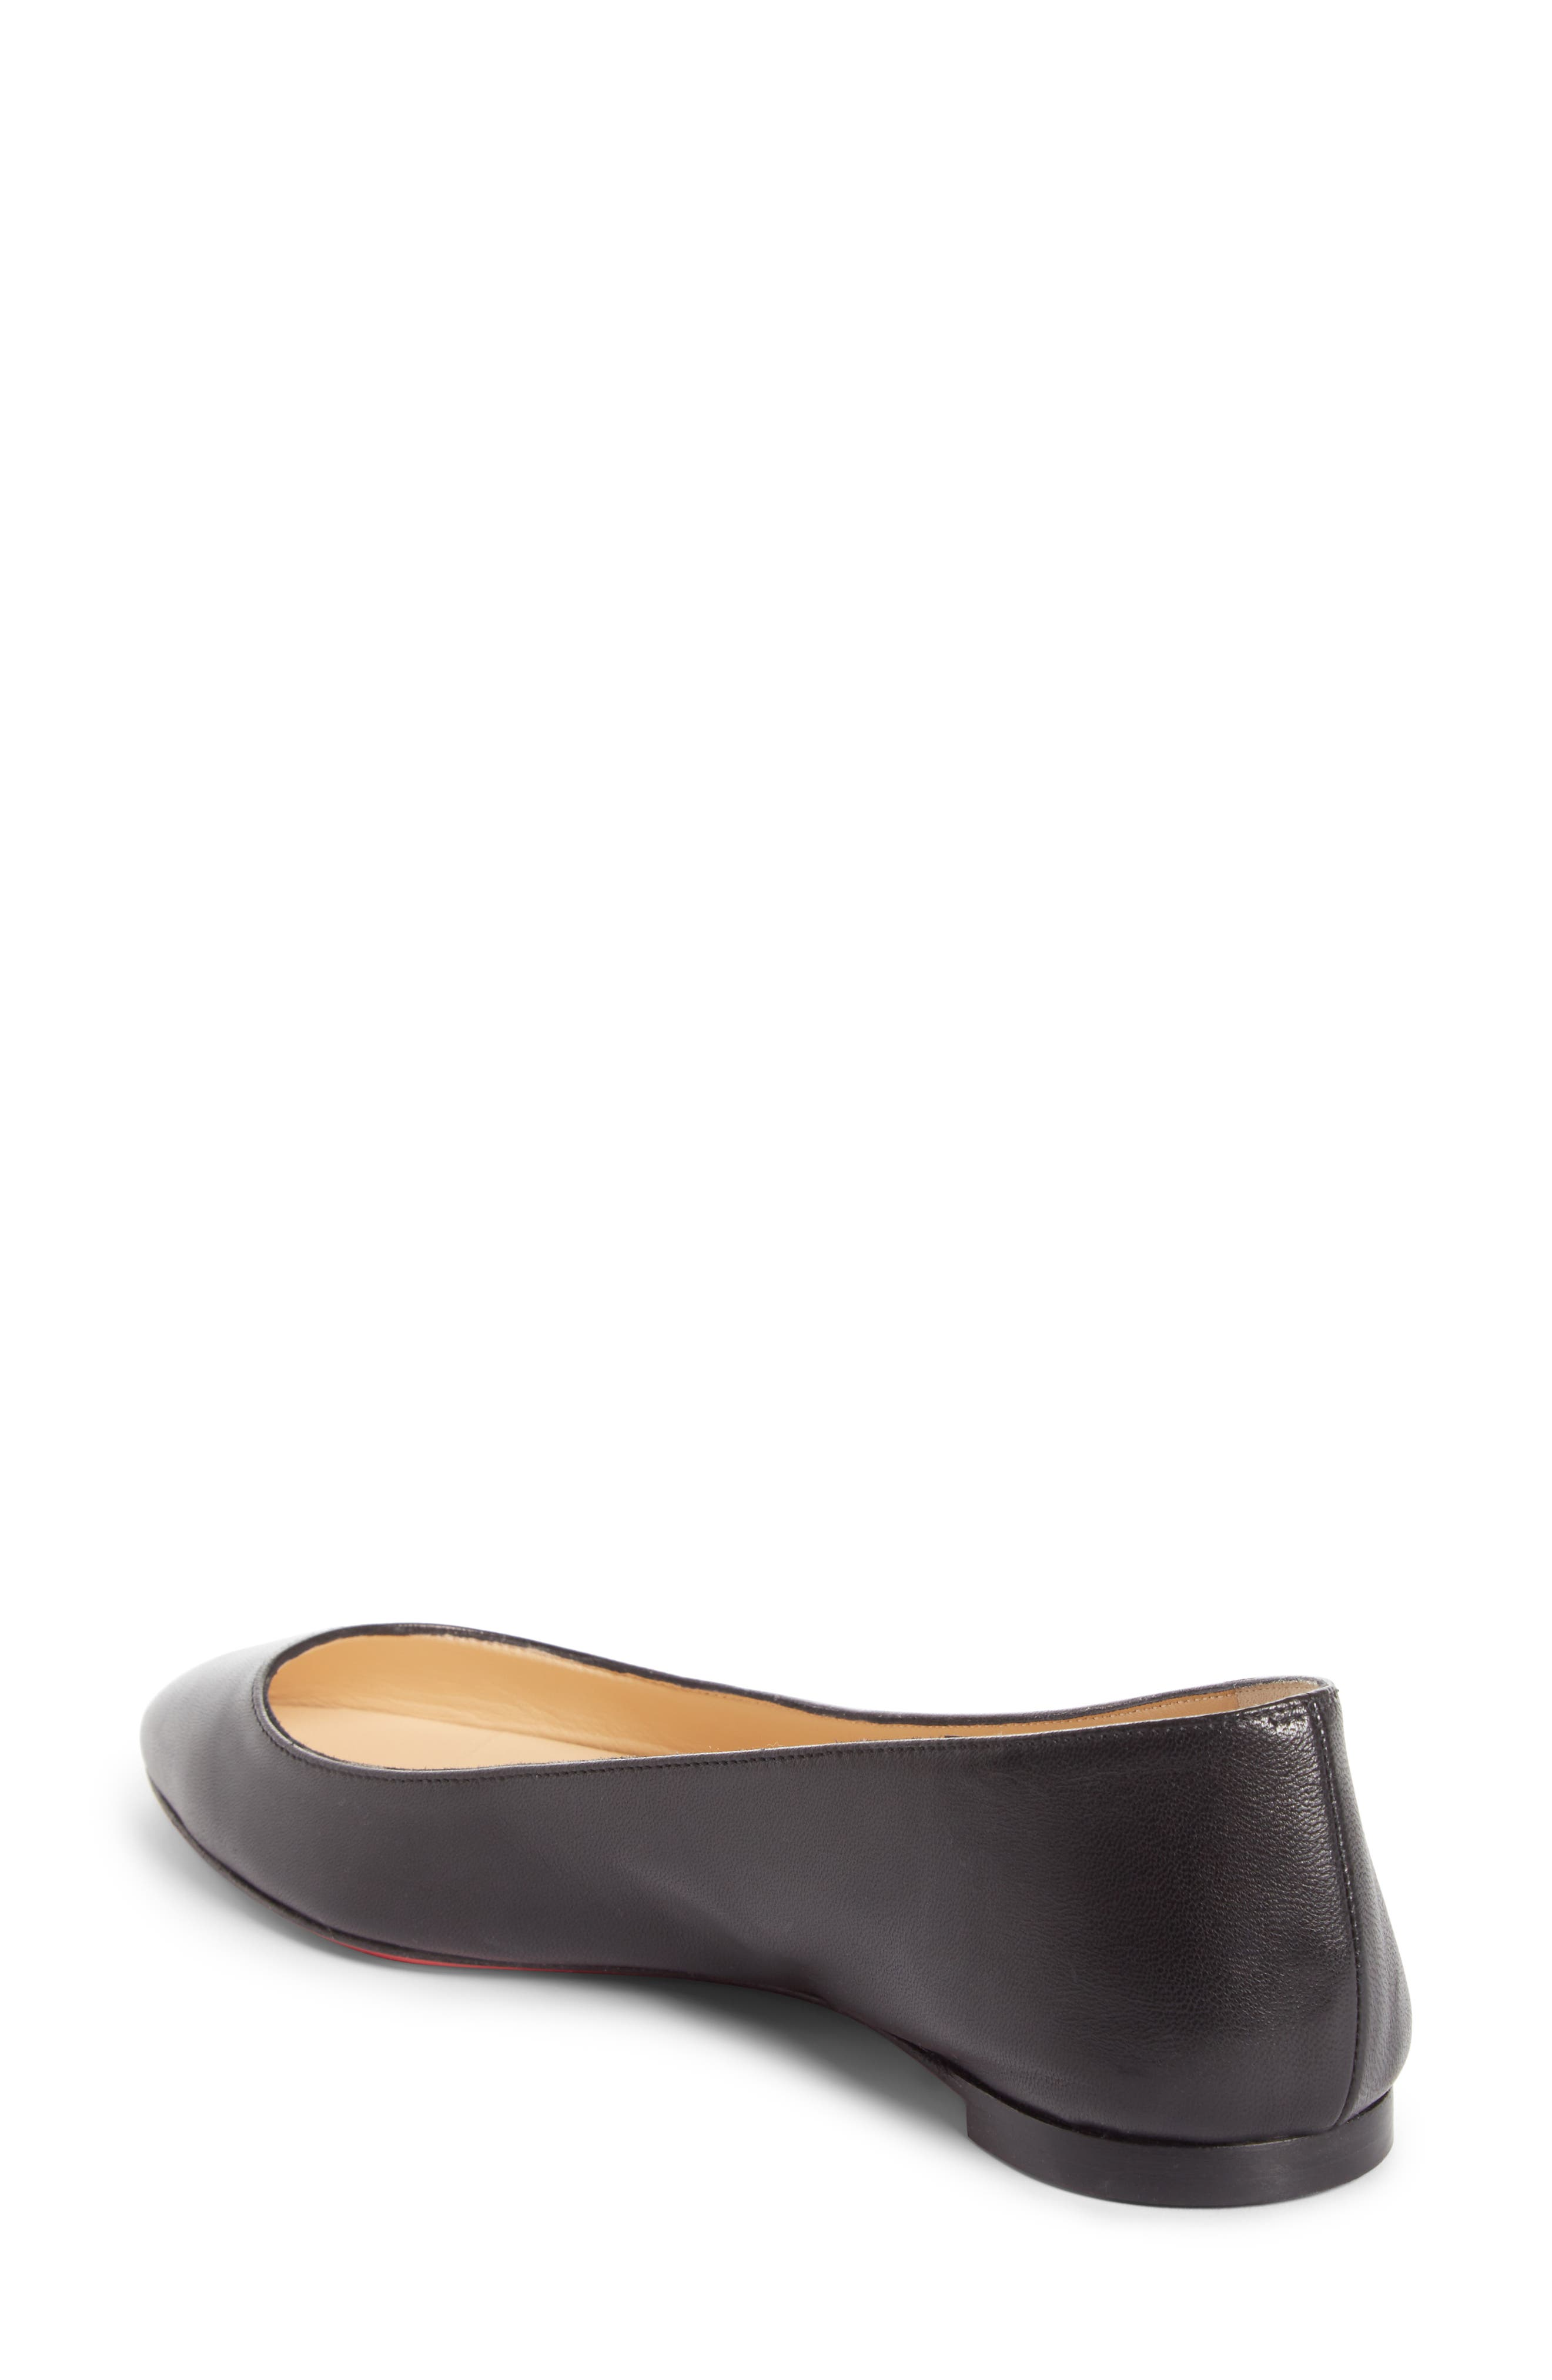 Eloise Flat,                             Alternate thumbnail 2, color,                             Black Leather